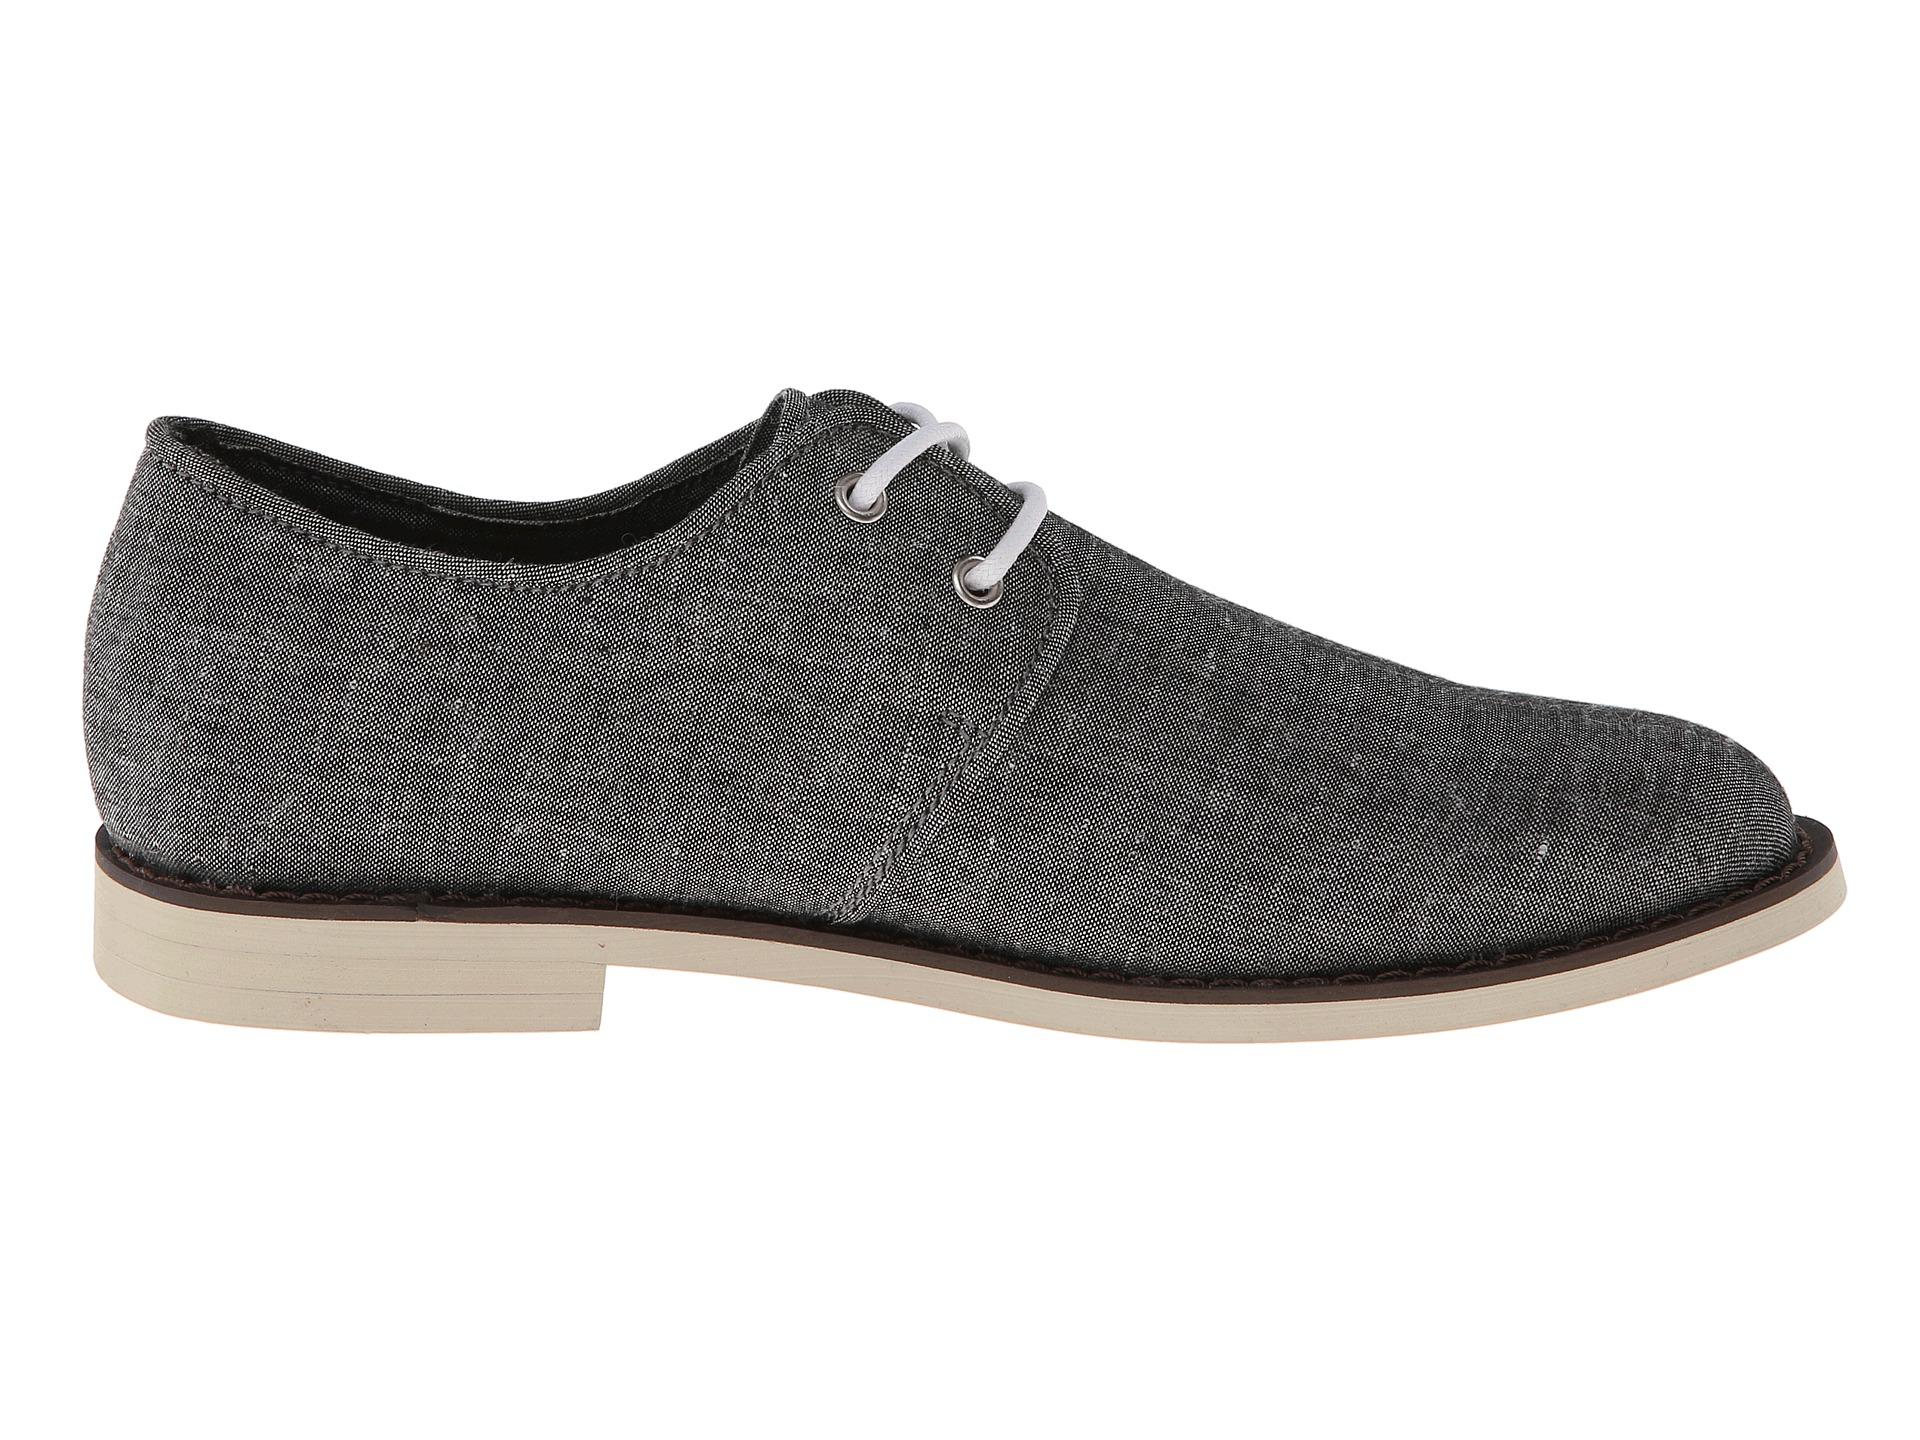 Generic Surplus Shoe Sizing